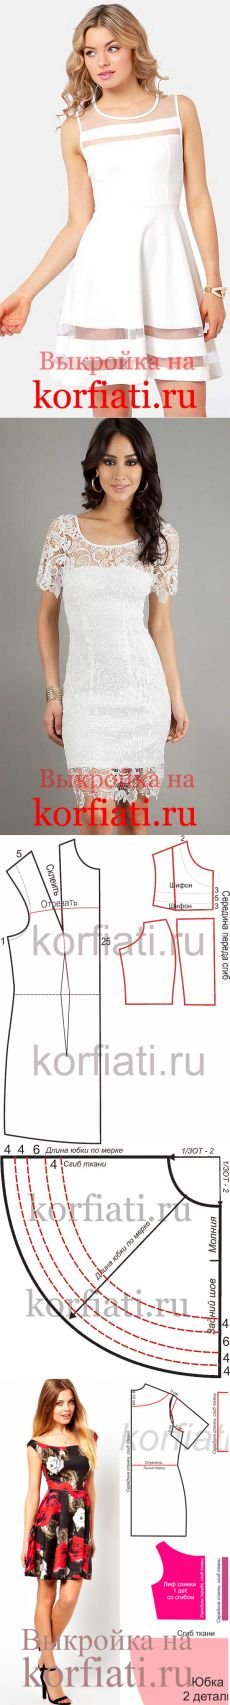 Los patrones de vestidos de novia de Anastasia Korfiati